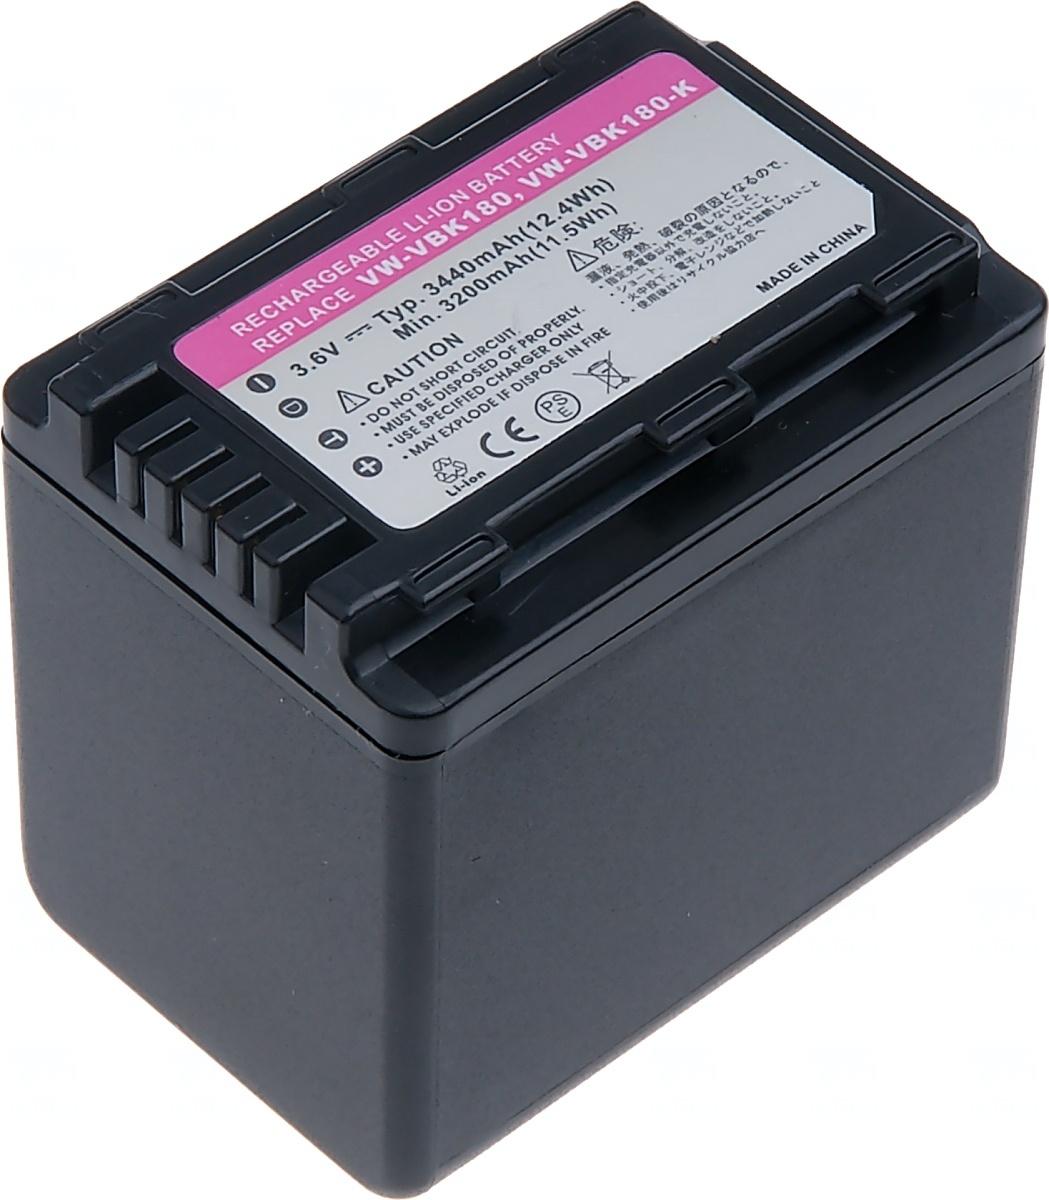 Baterie T6 power Panasonic VW-VBK360, 3440mAh, černá